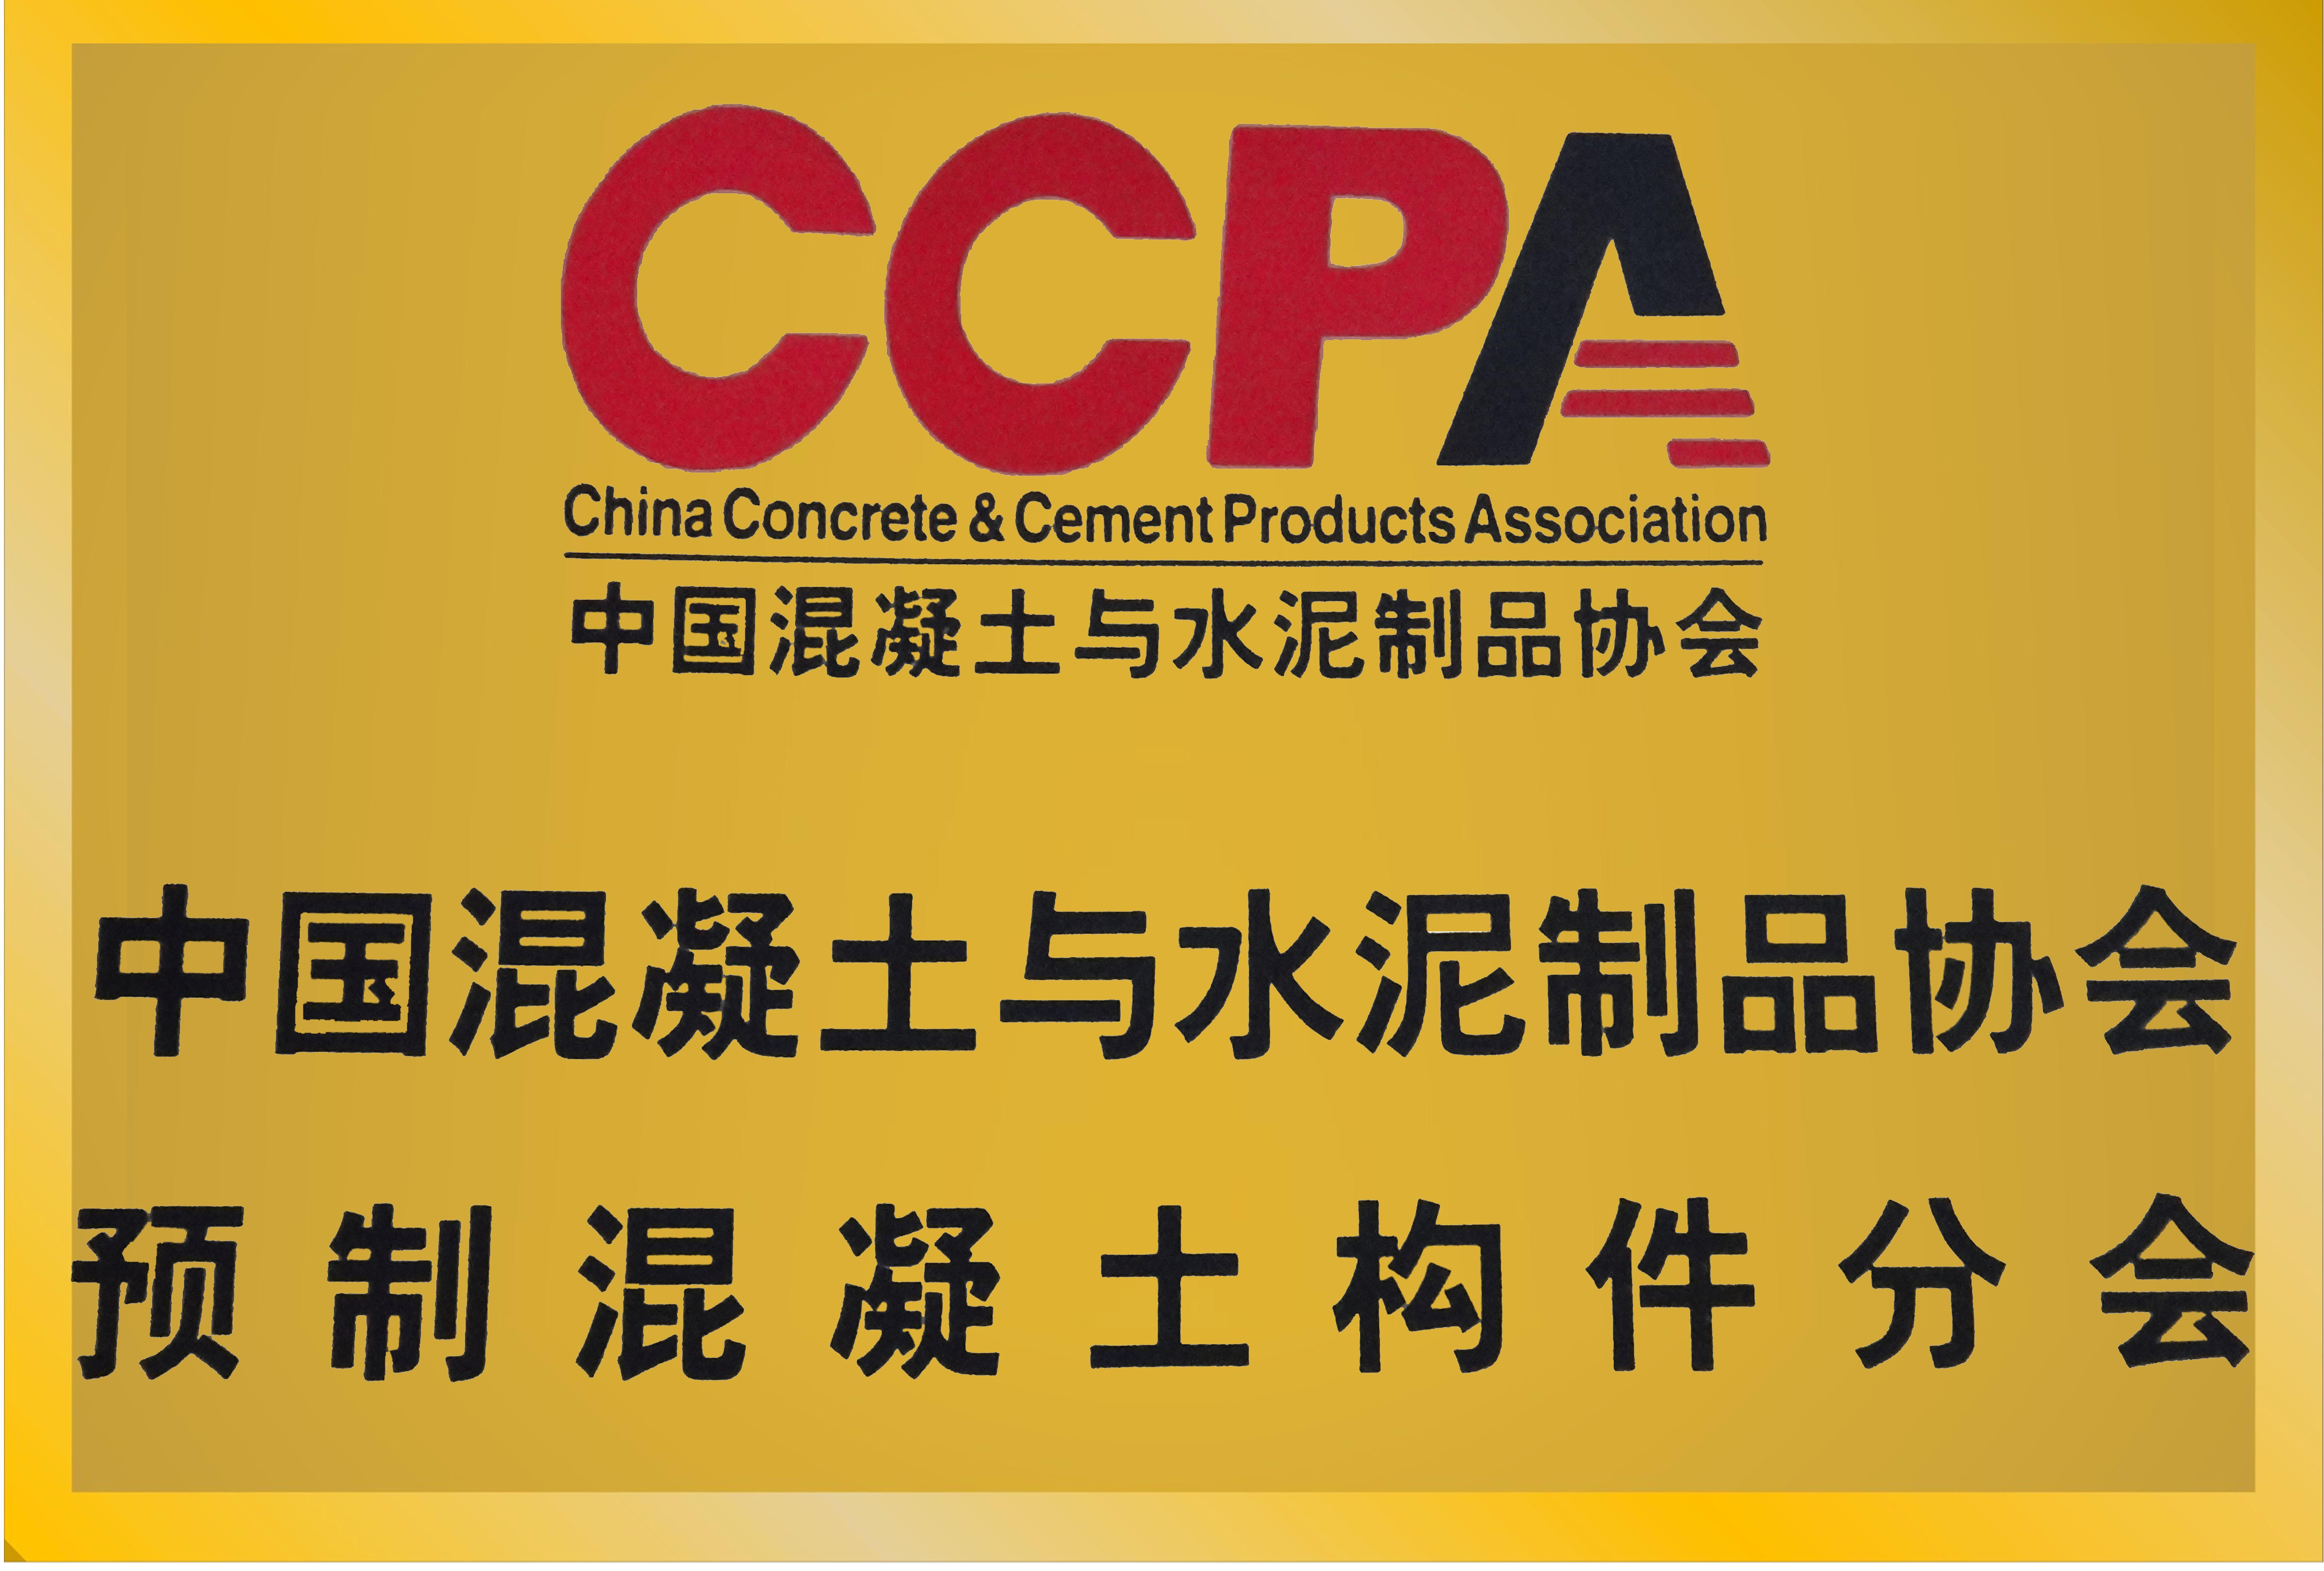 2.CCPA預制混凝土構件分會